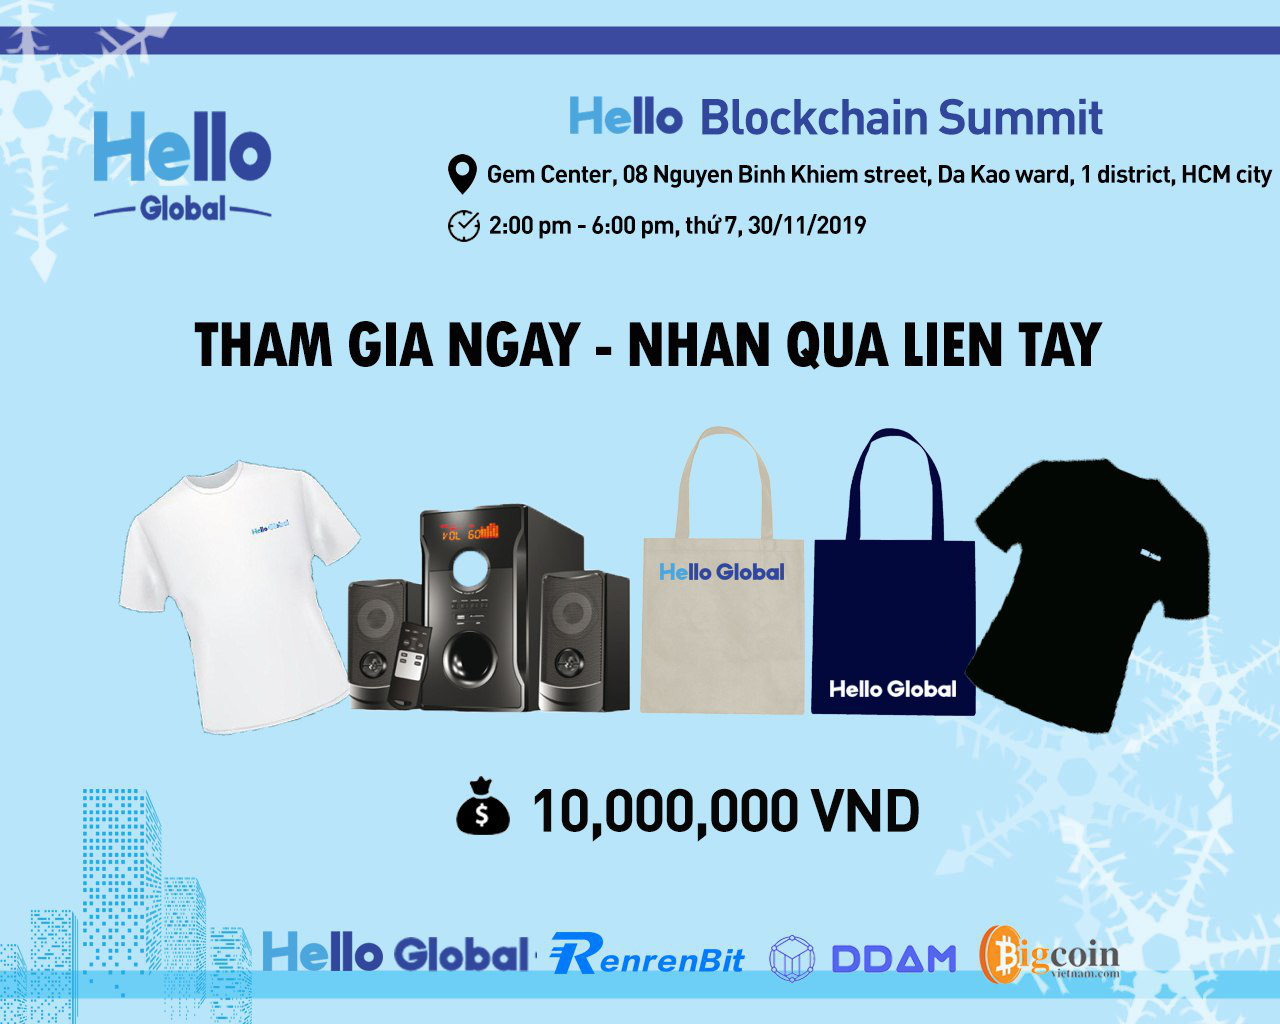 Phần thưởng tham gia Hello Blockchain Summit